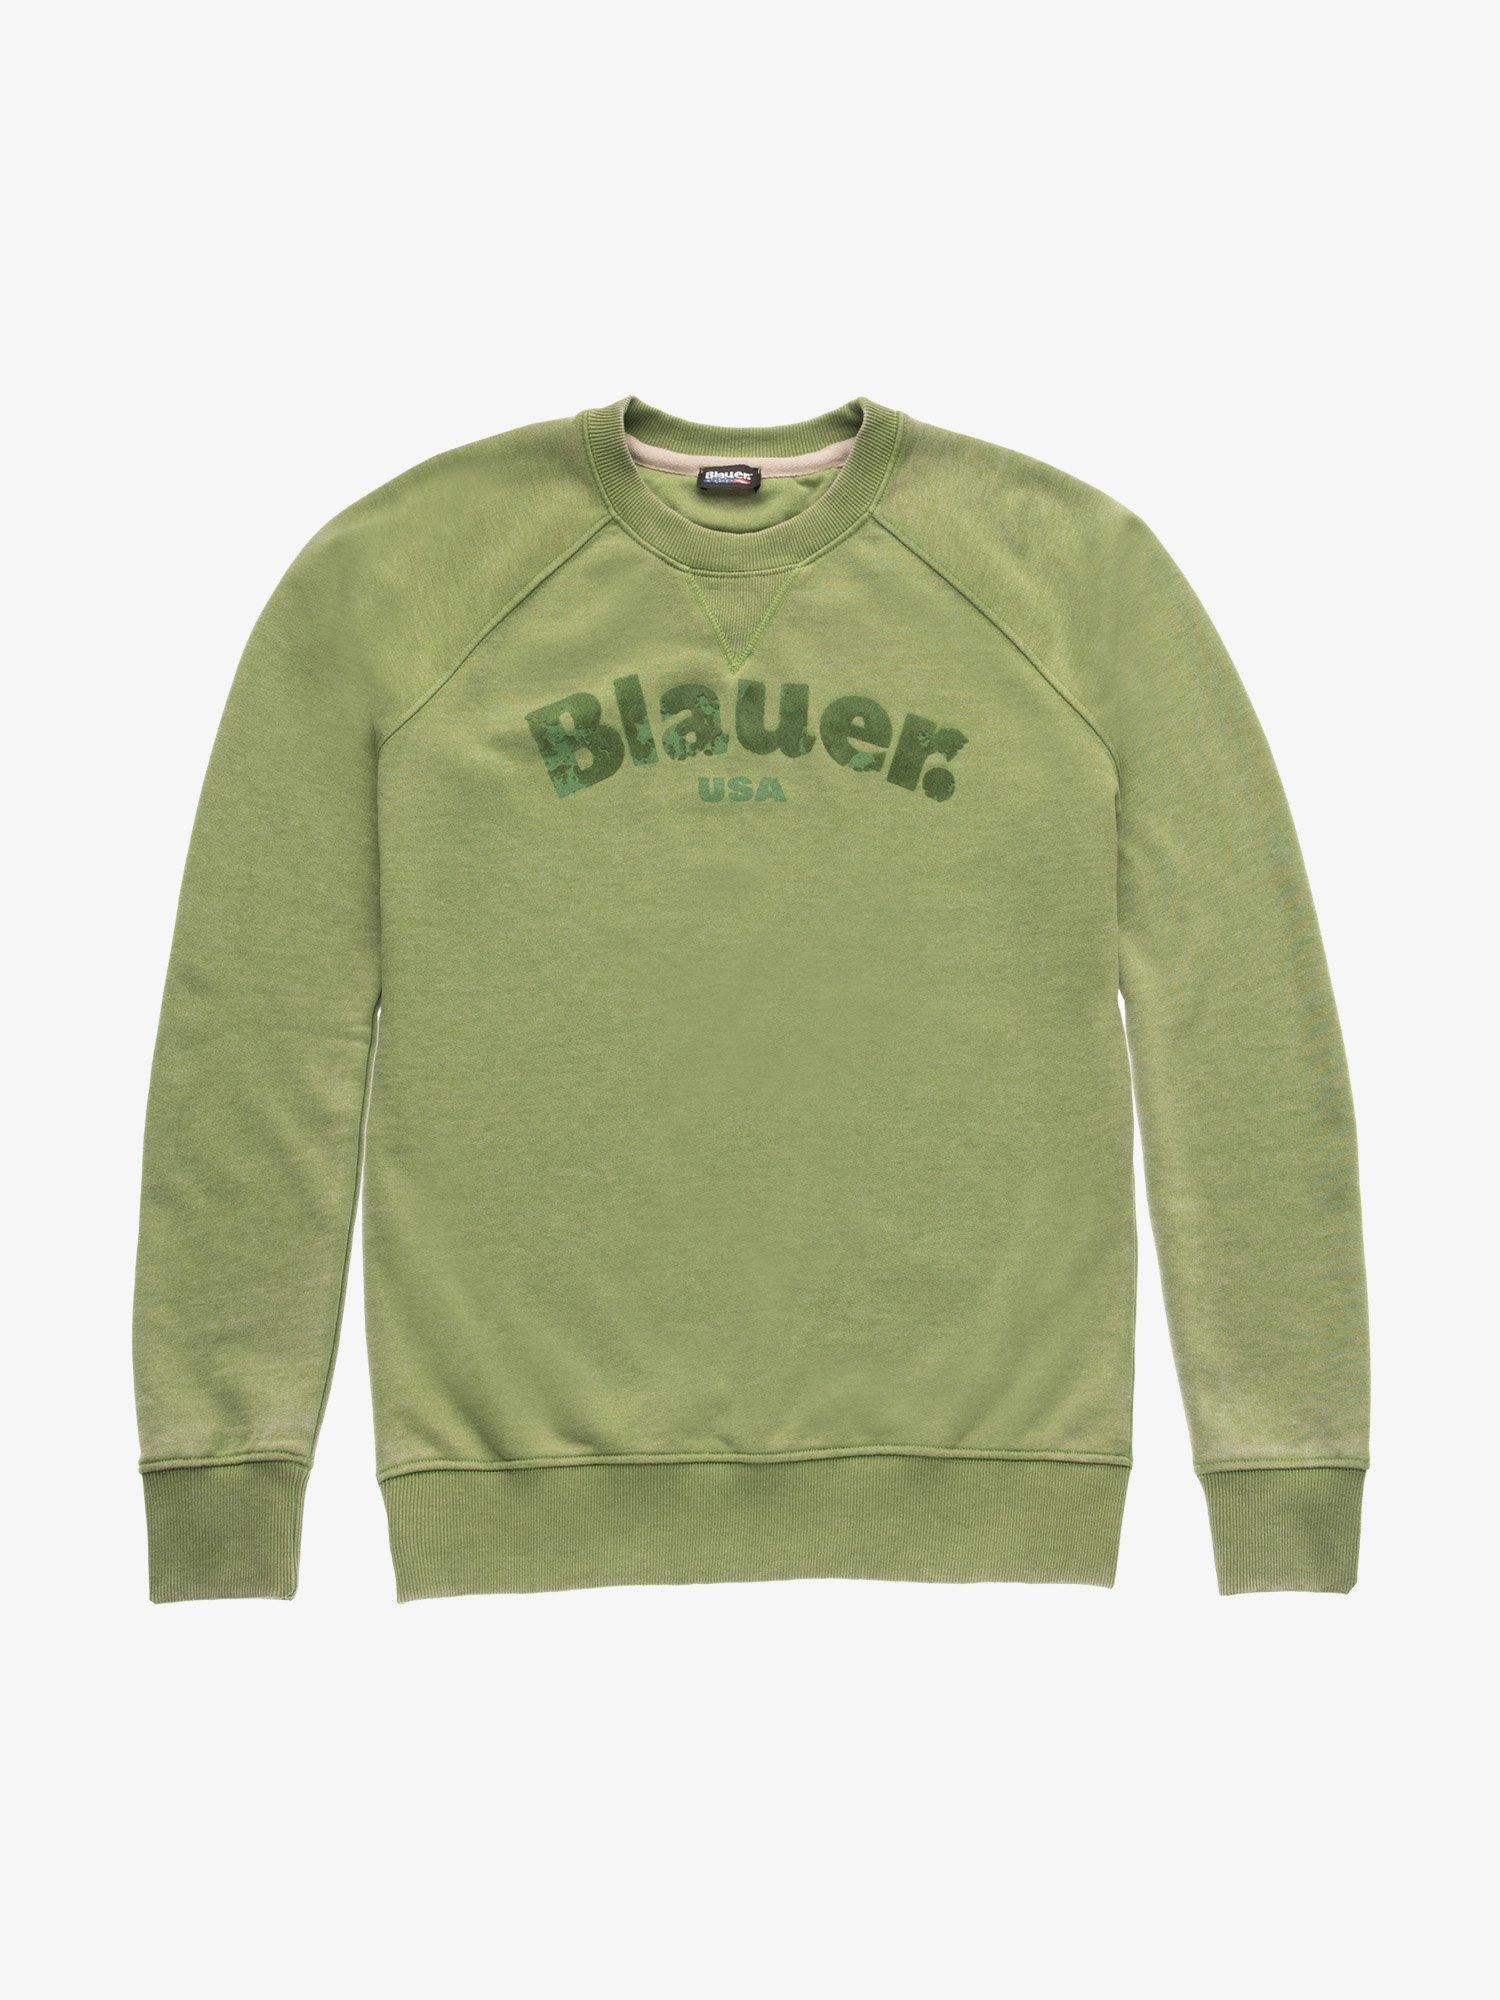 Blauer - СВИТШОТ ИЗ ТКАНИ БЕРНАУТ С КРУГЛЫМ ВЫРЕЗОМ - Green Pea - Blauer